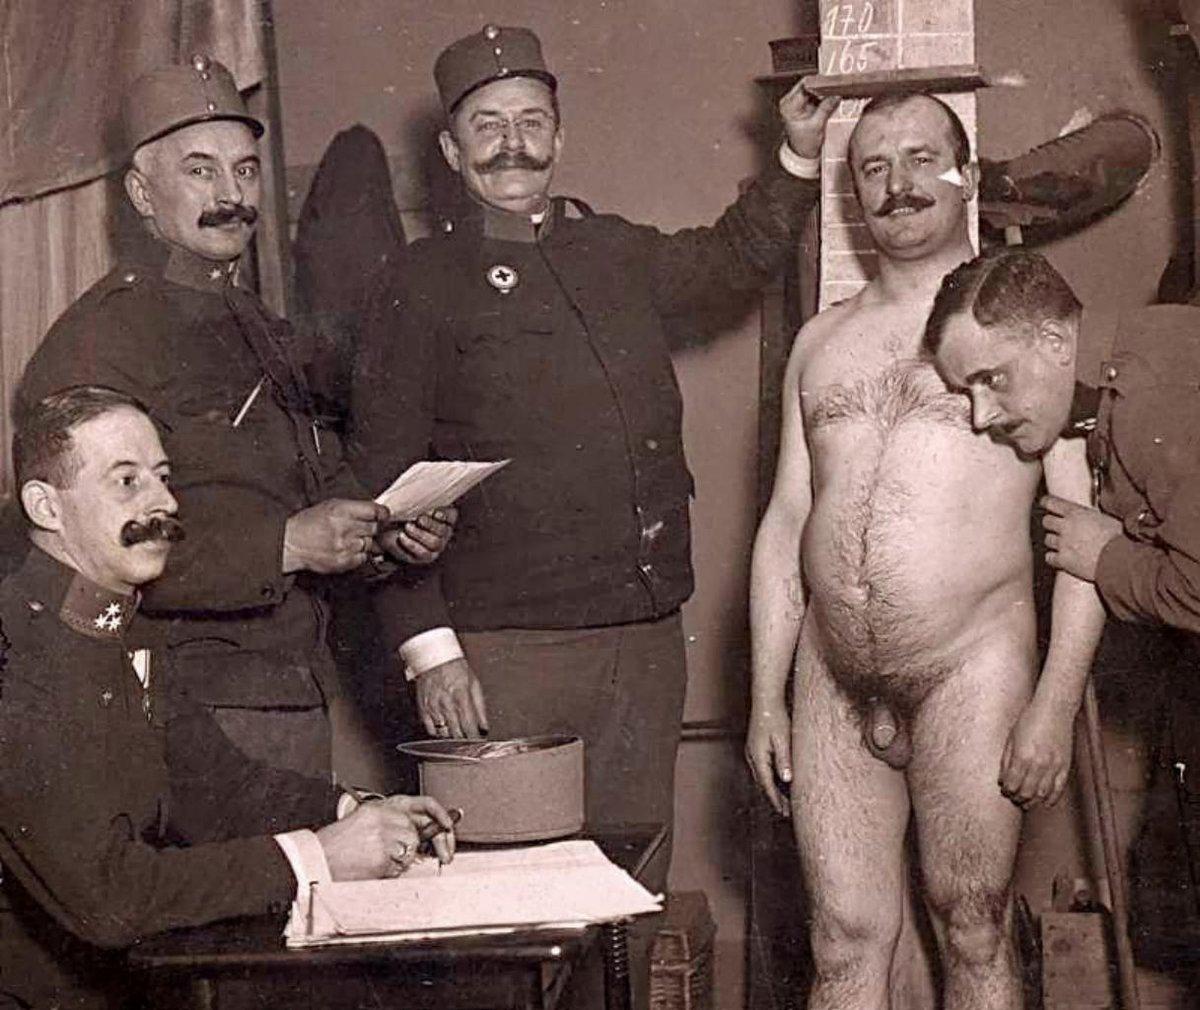 Naked gay jewish male sex pics full length pledges had no biz in